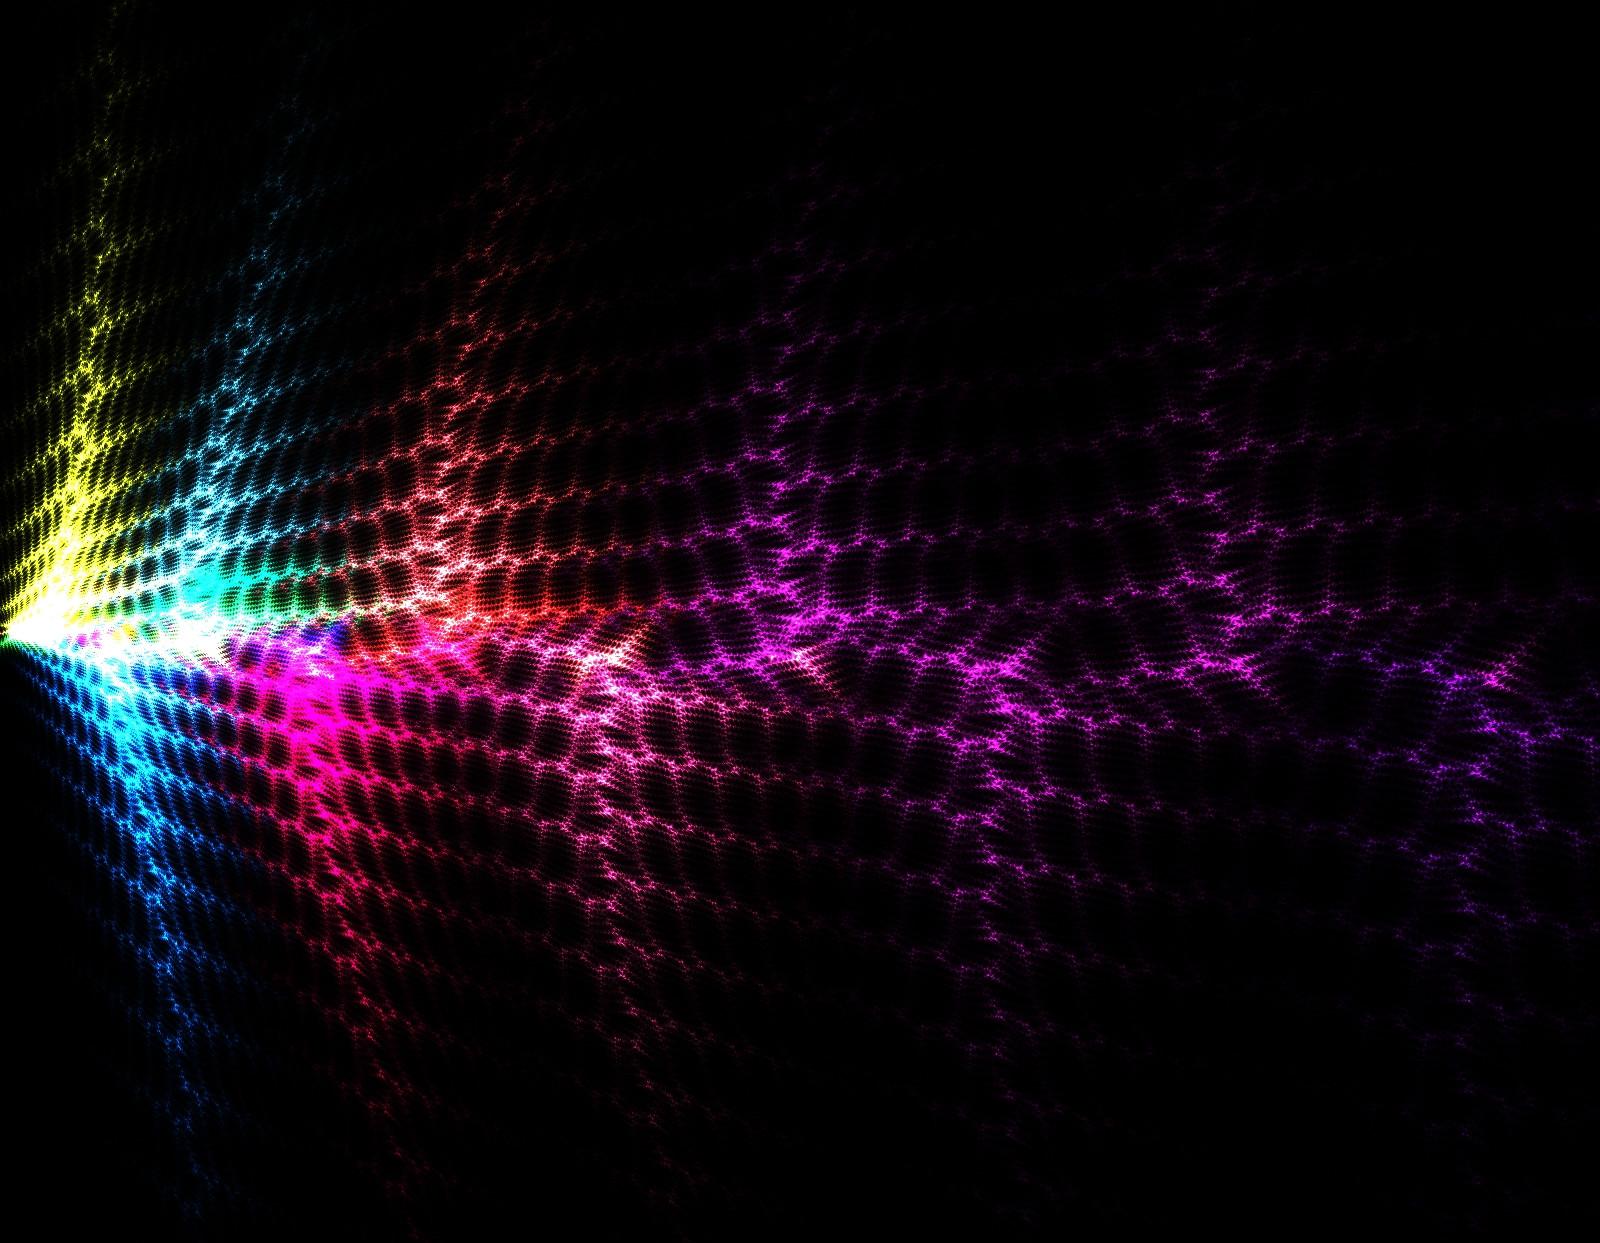 Moving Sound Waves Wallpaper HD Wallpapers on picsfaircom 1600x1243